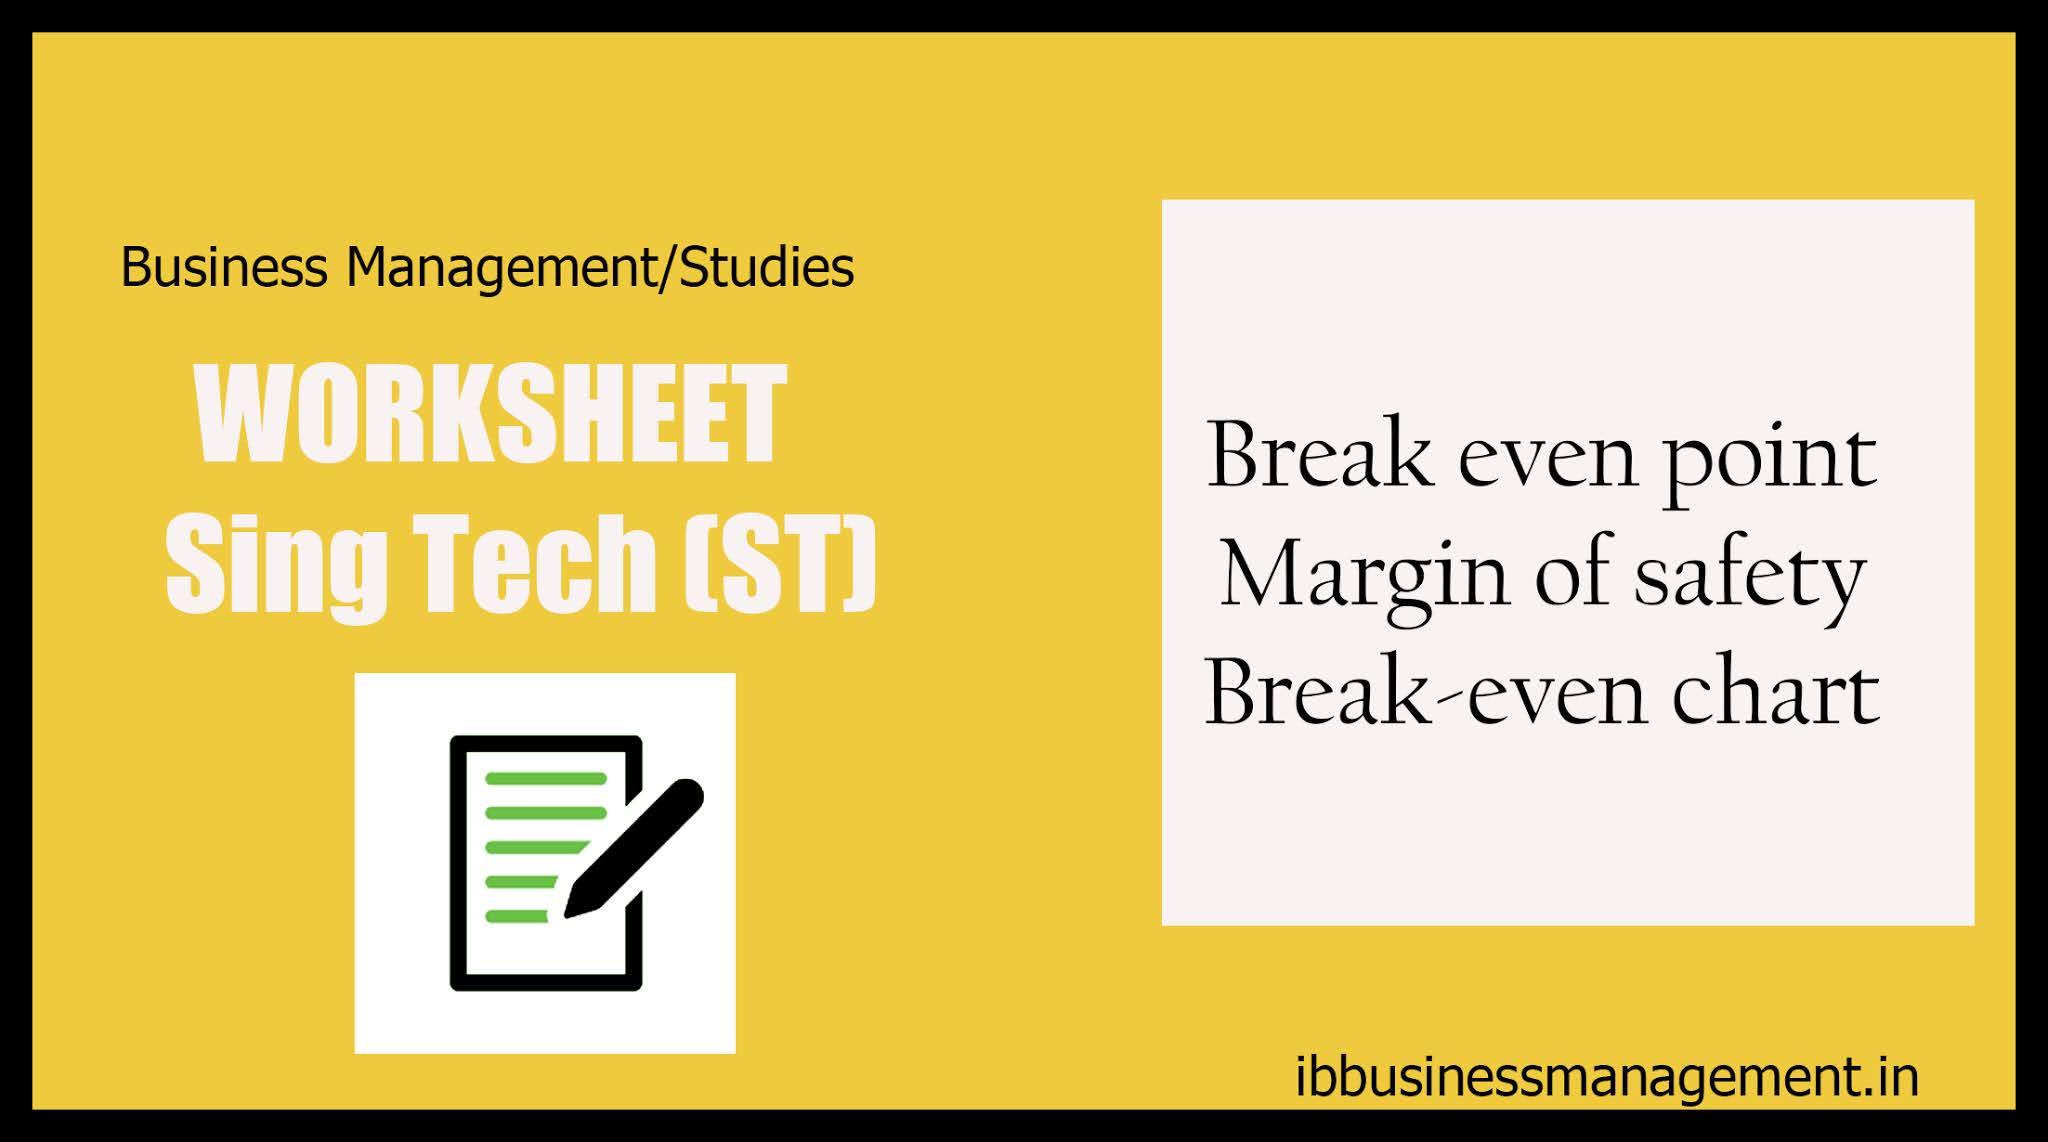 Accounts and Finance Work Sheet: Singh Tech